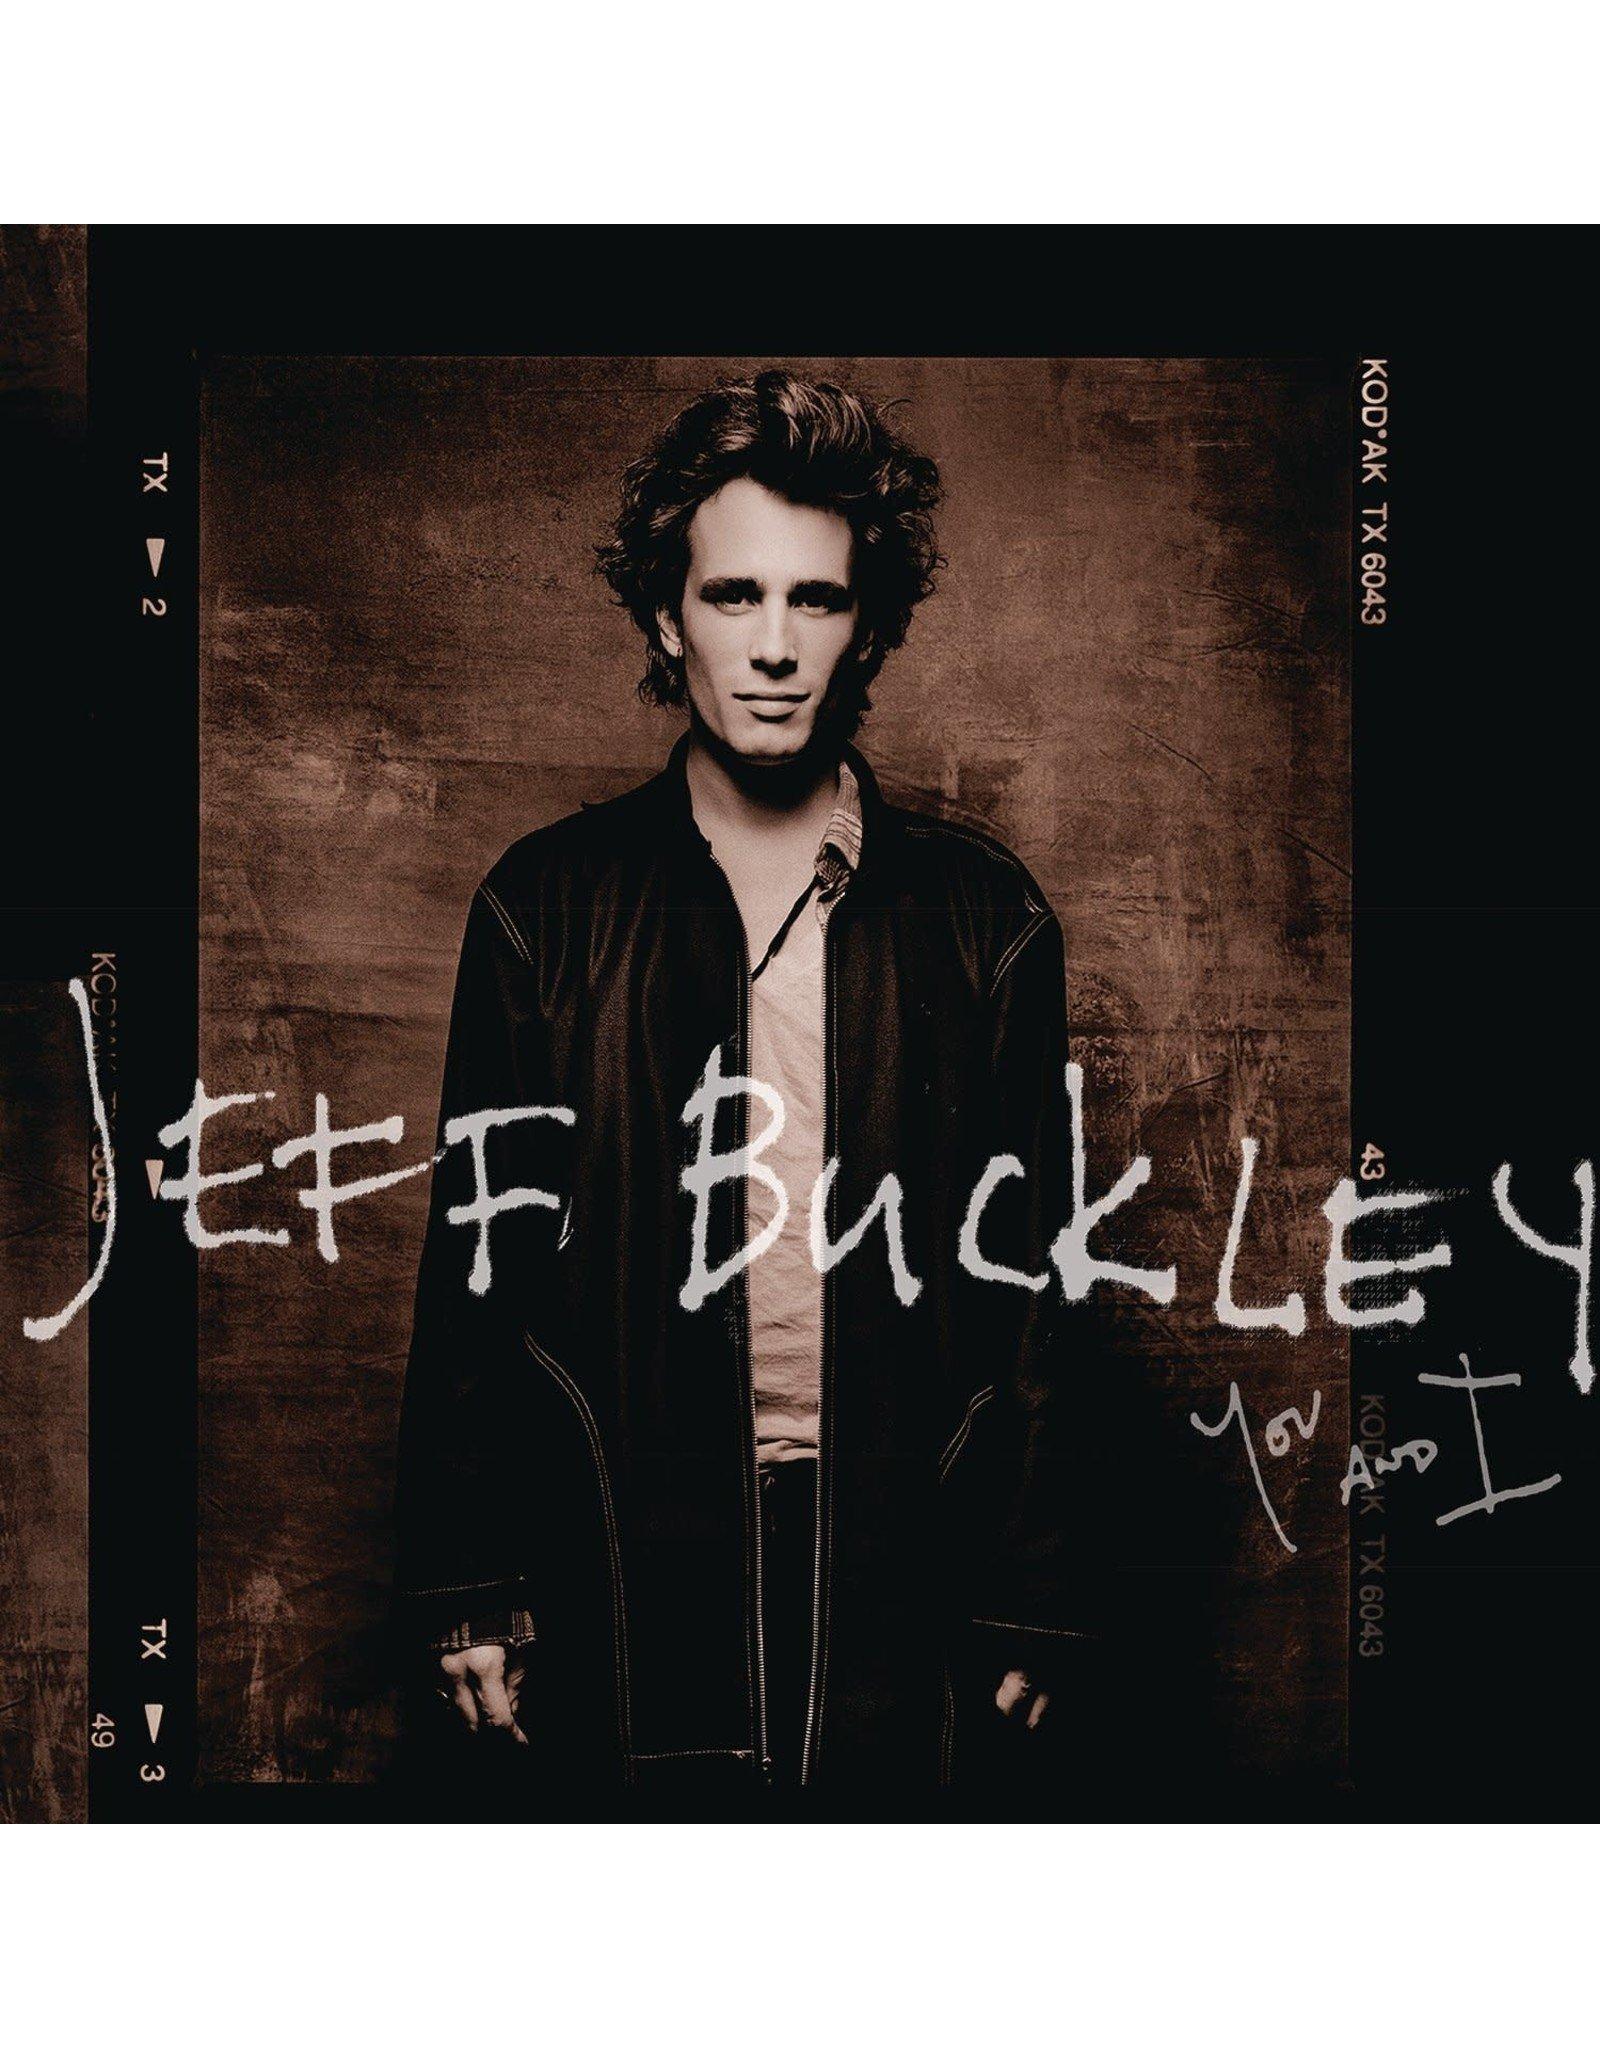 Jeff Buckley - You & I (Covers Album)